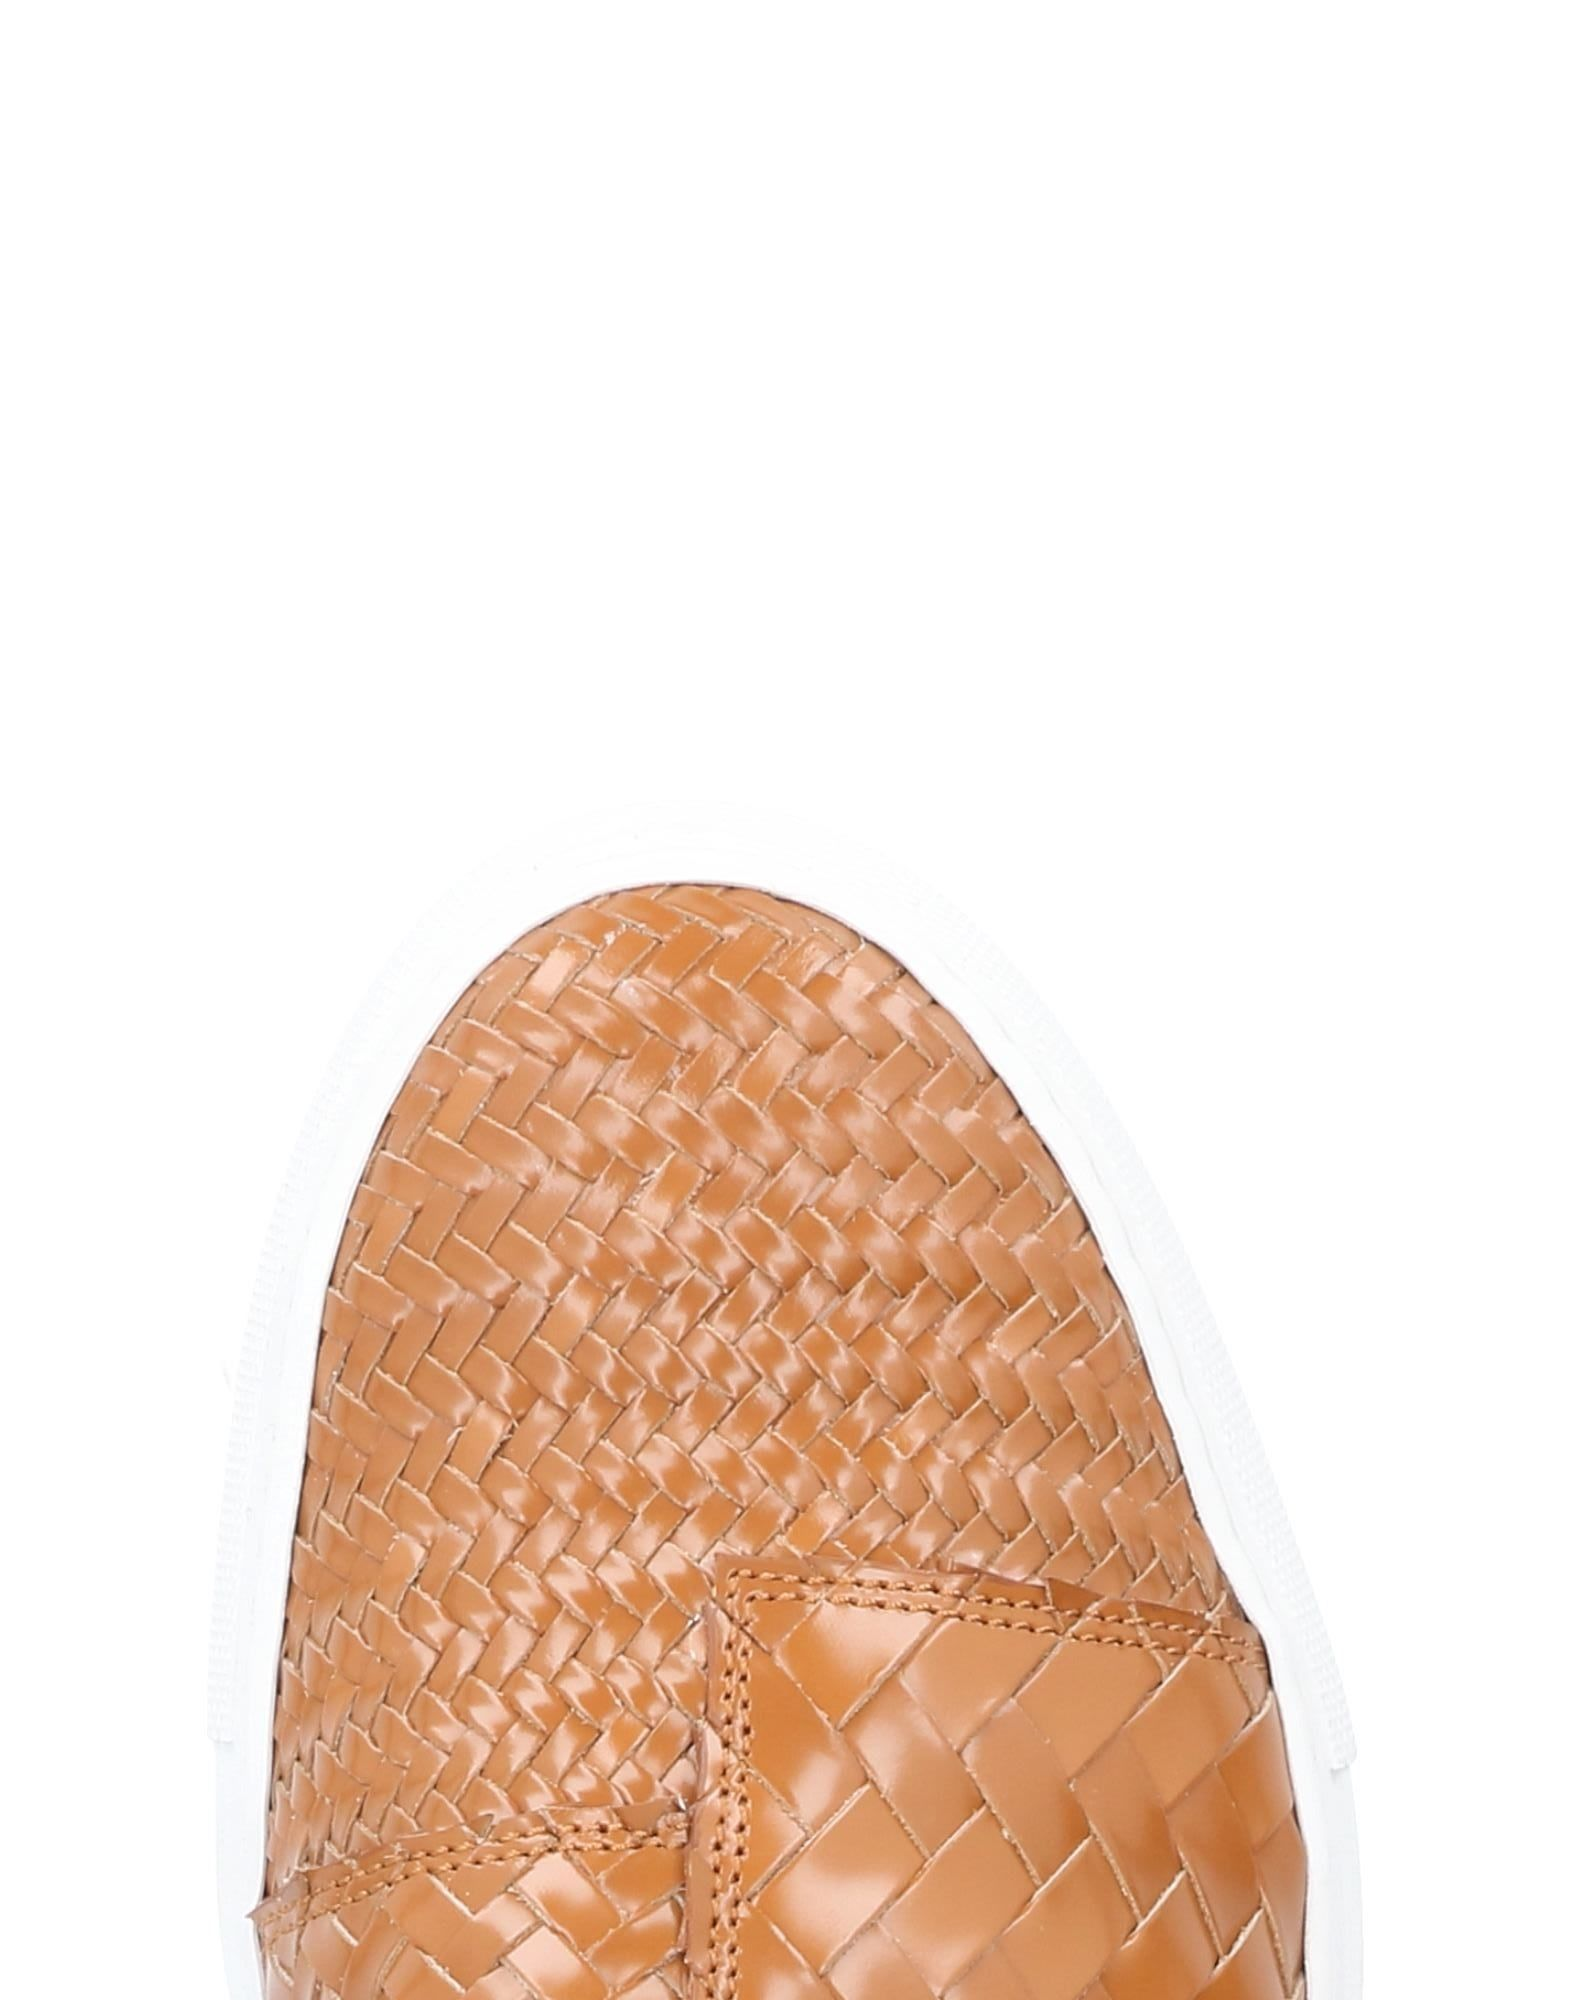 Raparo Sneakers Herren  11459760ER Schuhe Gute Qualität beliebte Schuhe 11459760ER 85ad67